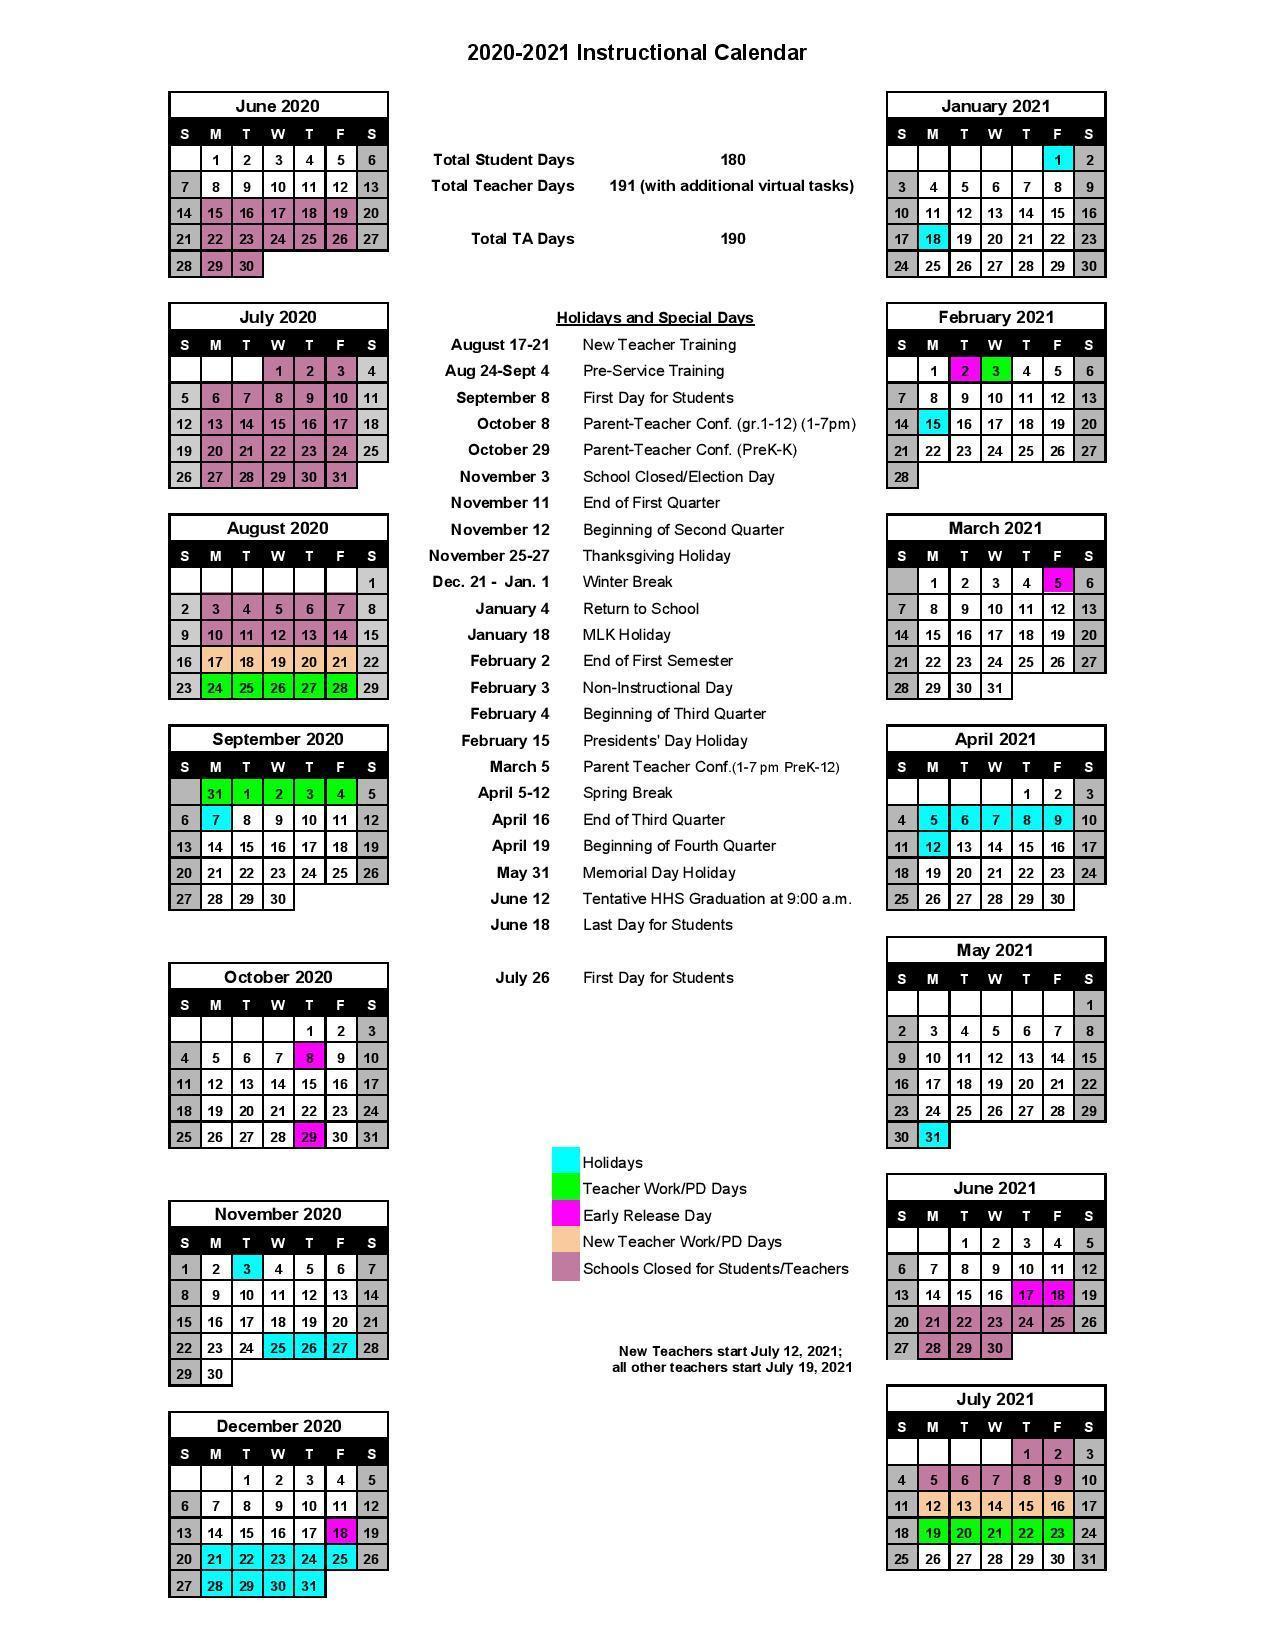 Academy 1 Jersey City Public School Calendar | Printable For Las Cruces Public School Calendar 2021